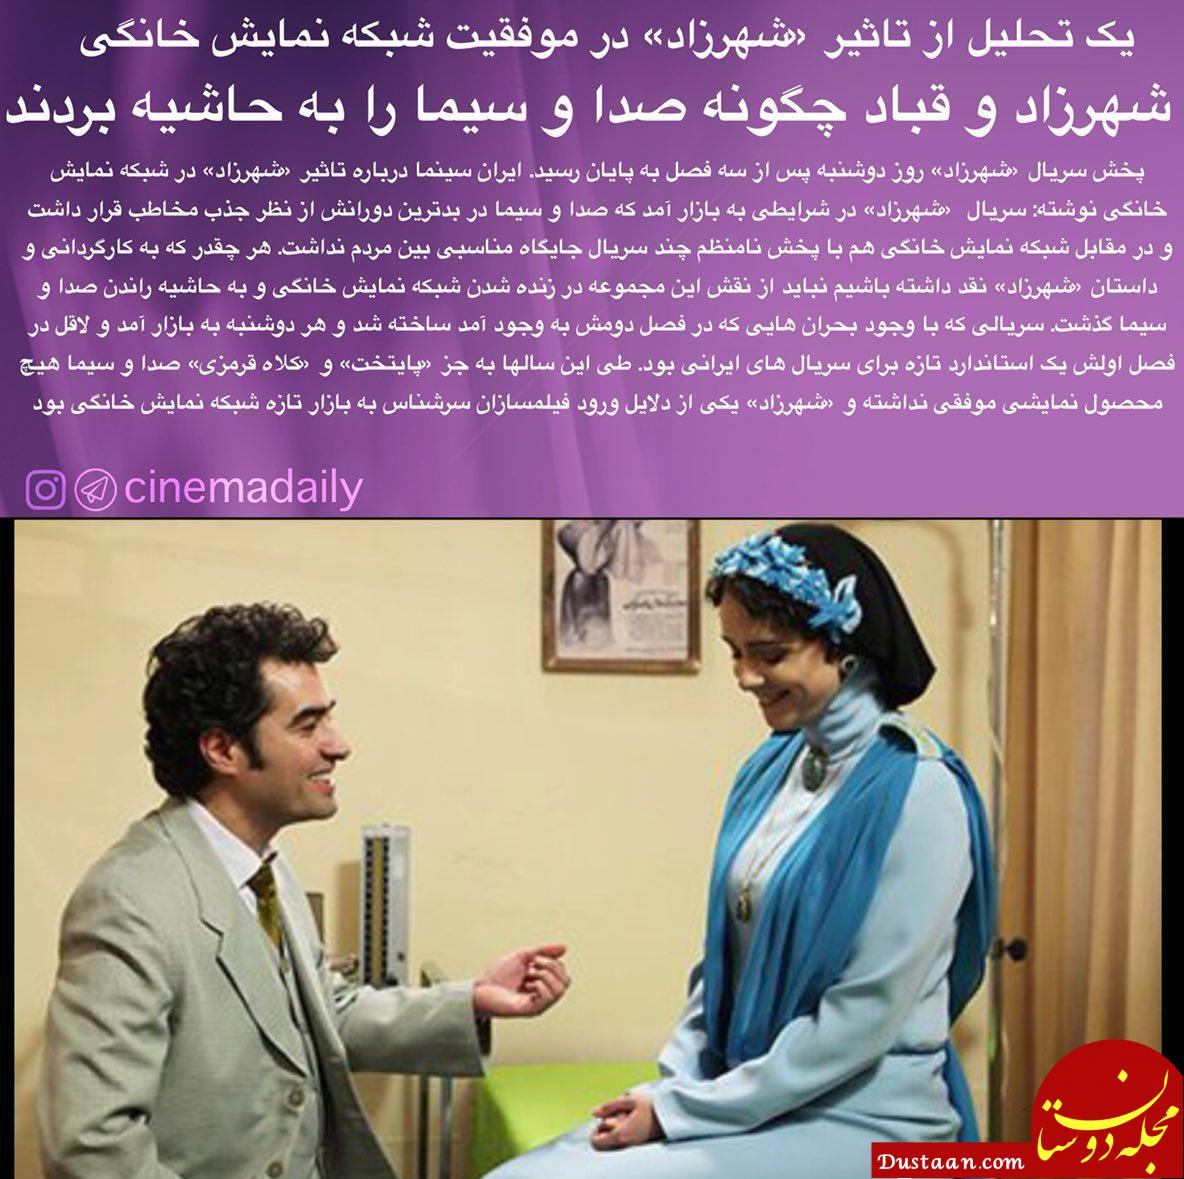 www.dustaan.com شهرزاد و قباد چگونه صدا و سیما را به حاشیه بردند؟